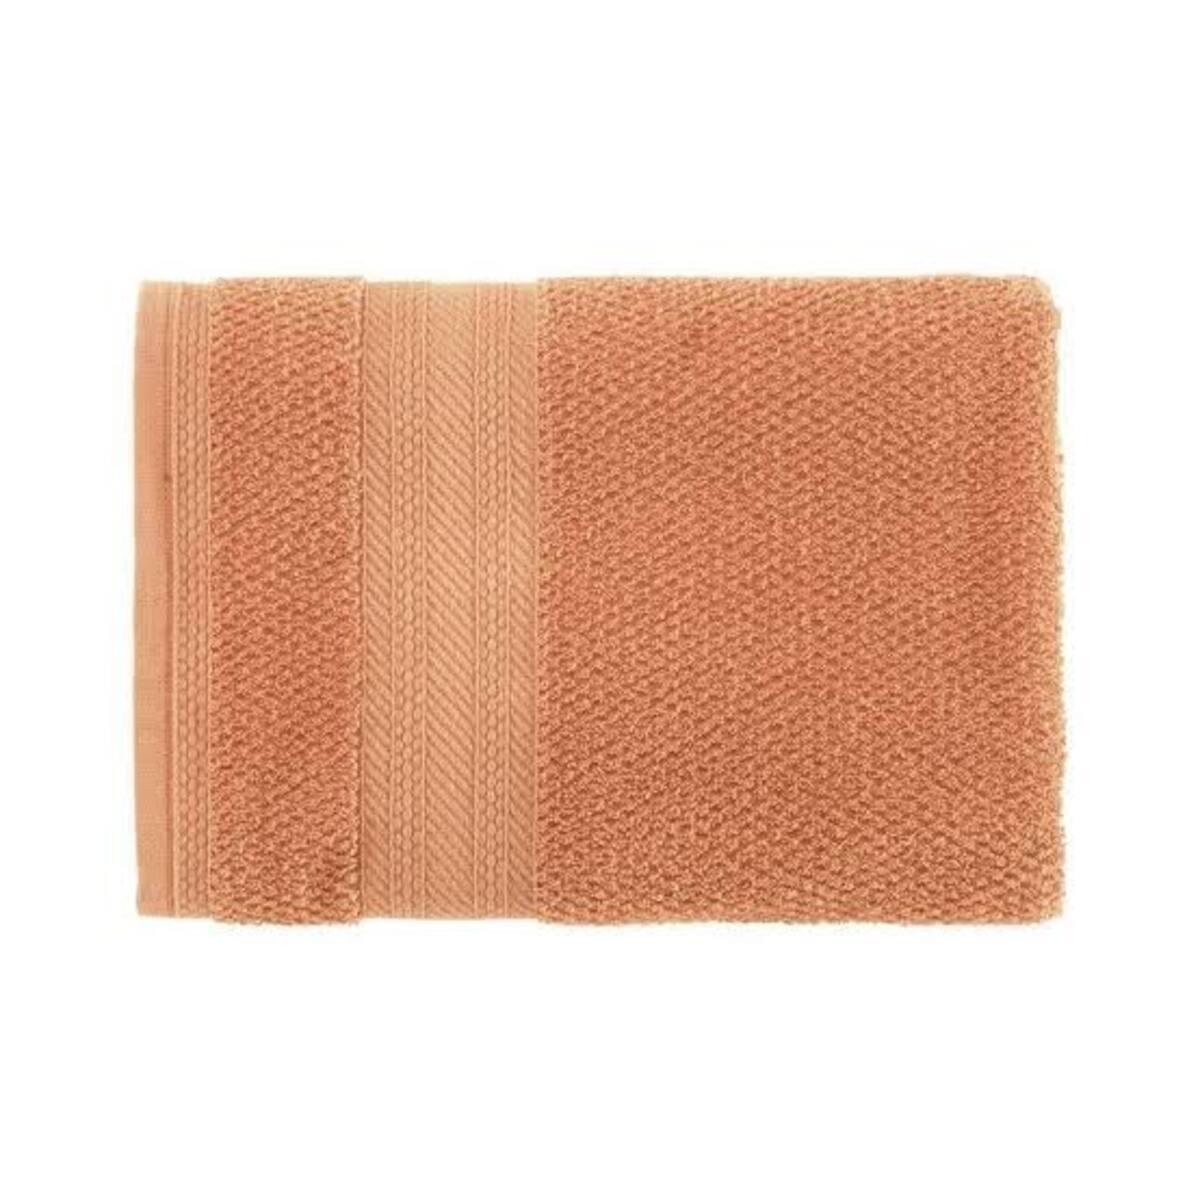 Toalha rosto empire 48x70 Laranja Vibrante